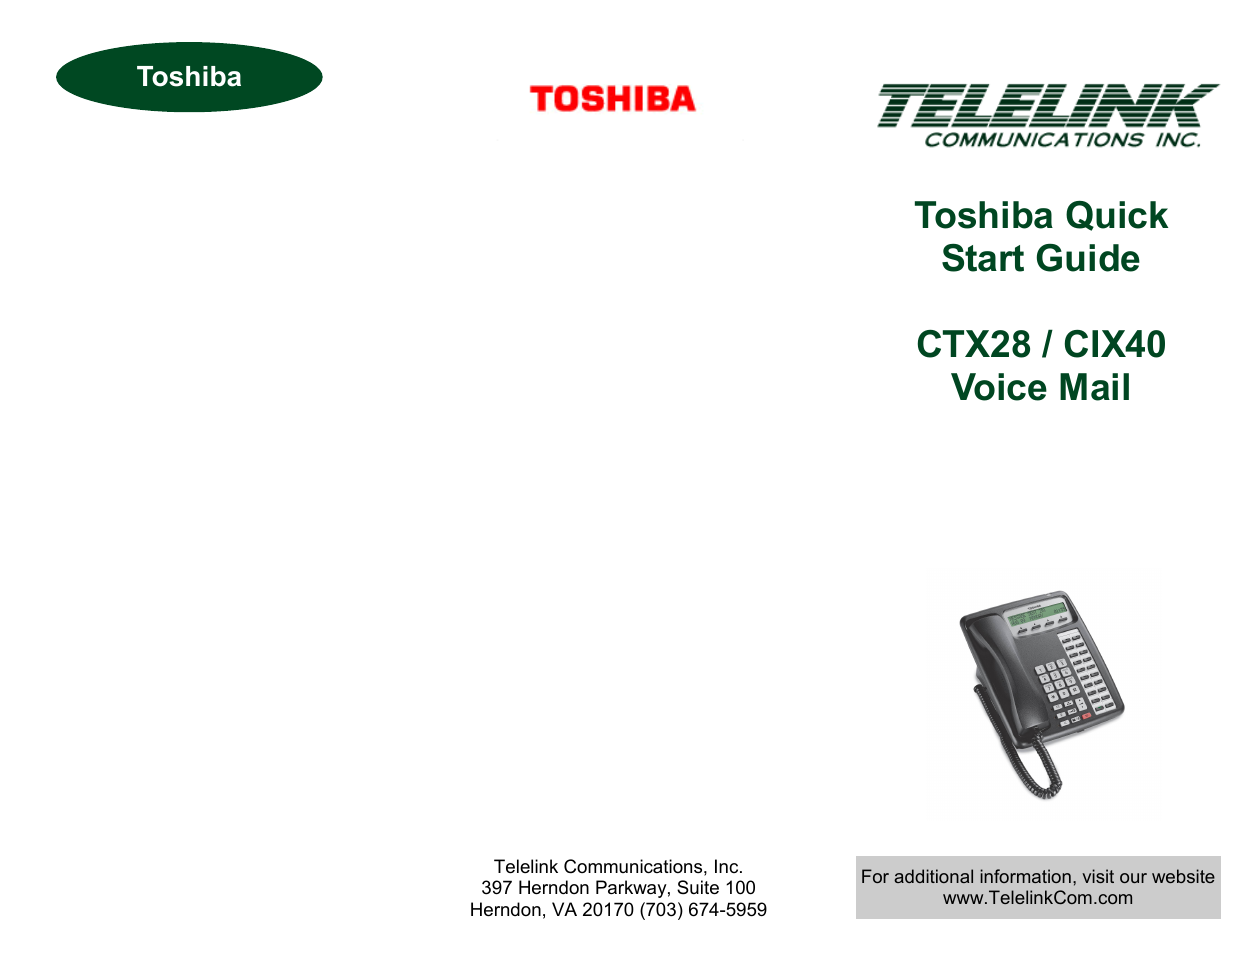 toshiba cix40 user manual 2 pages also for ctx28 rh manualsdir com Toshiba Strata Phone System Toshiba Strata Phone System